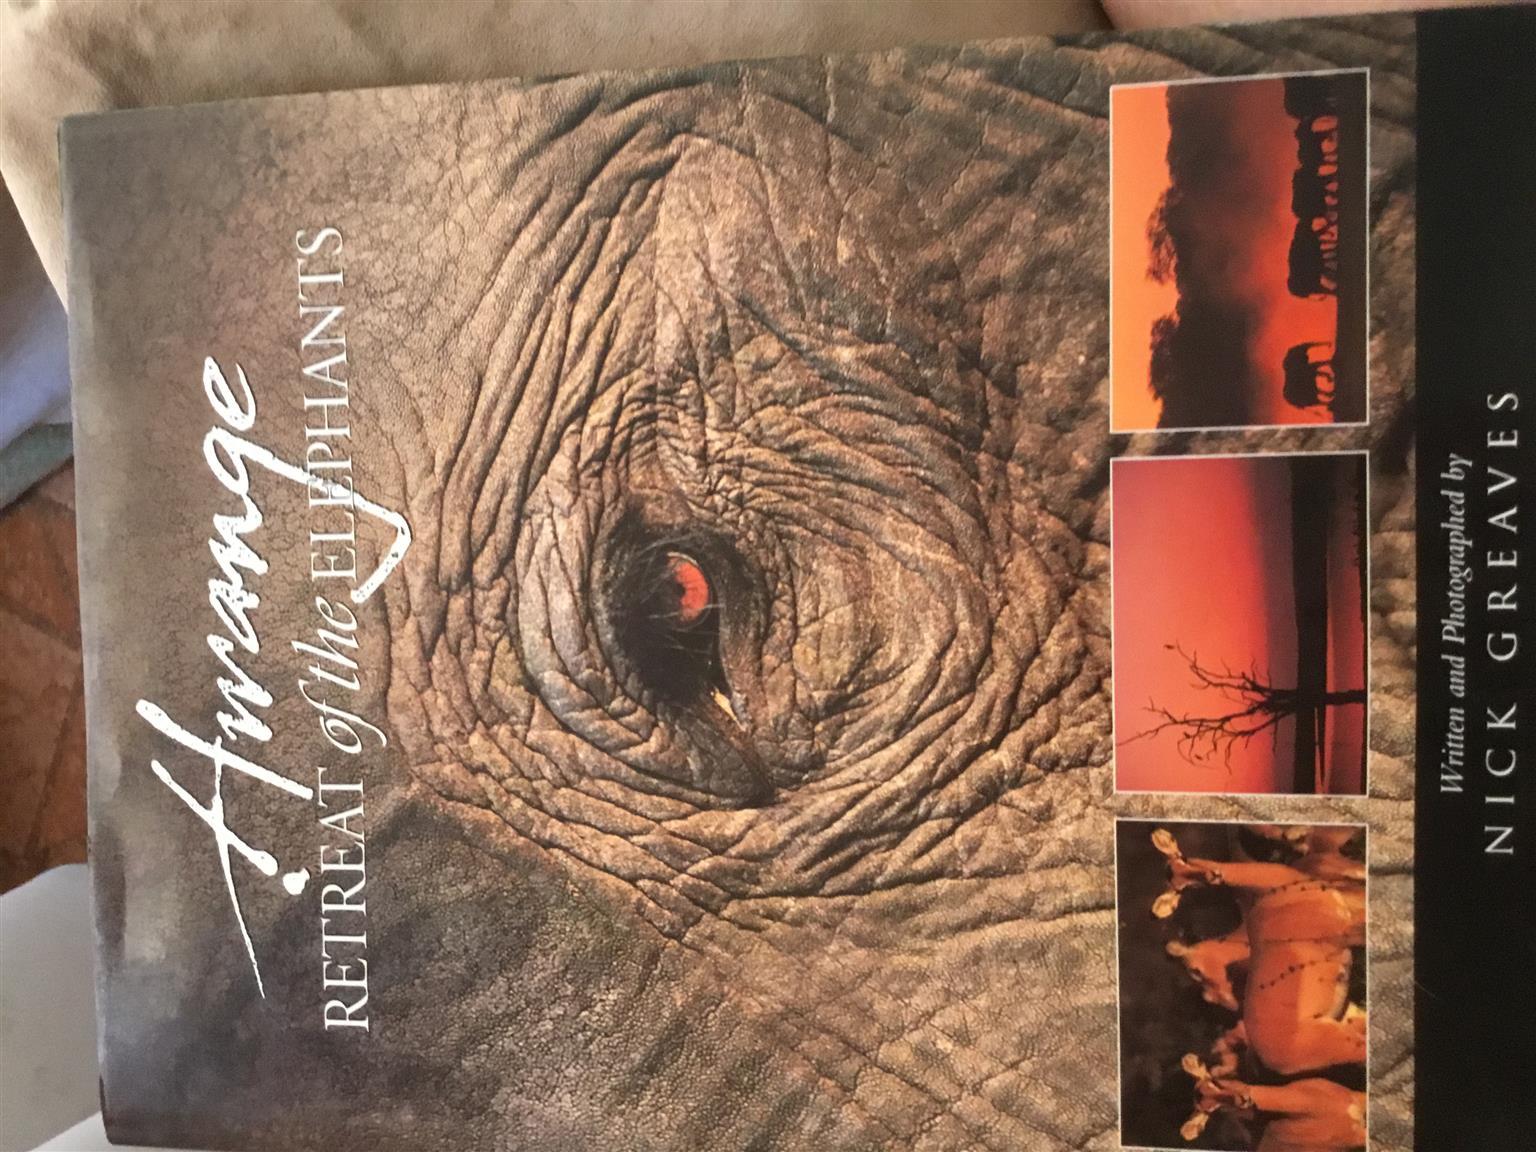 Hwange: Retreat Of The Elephants